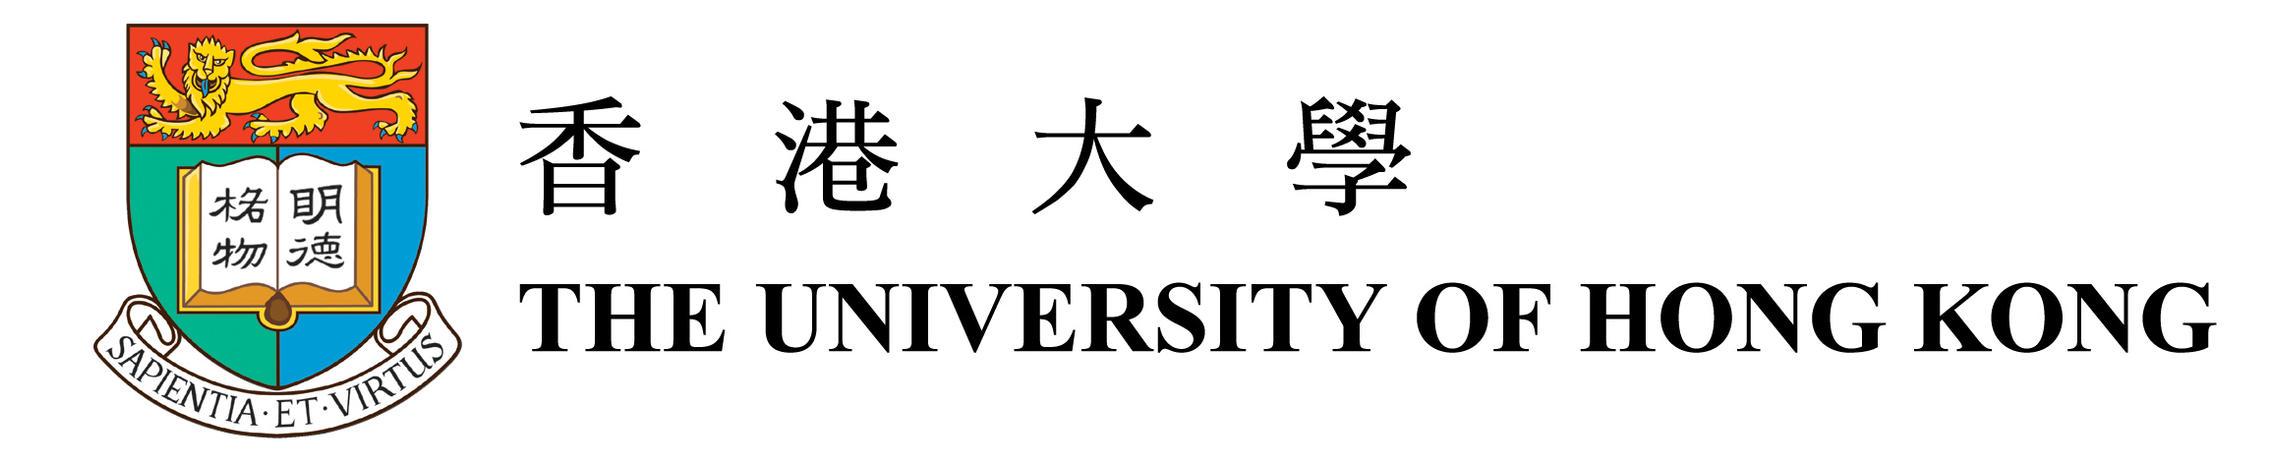 logo_hku_horizontal.jpg